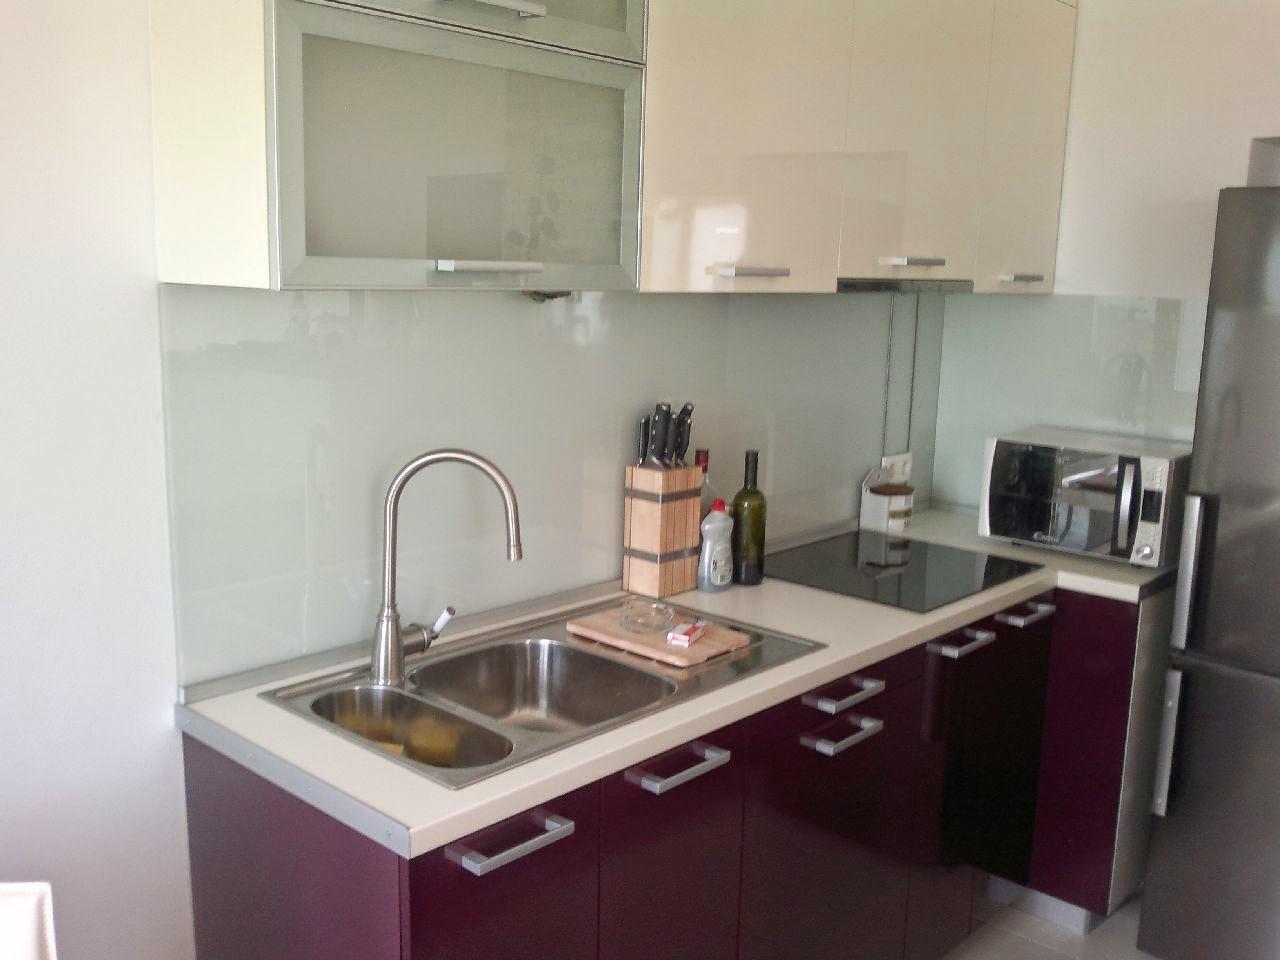 Aubergine MiN kitchen